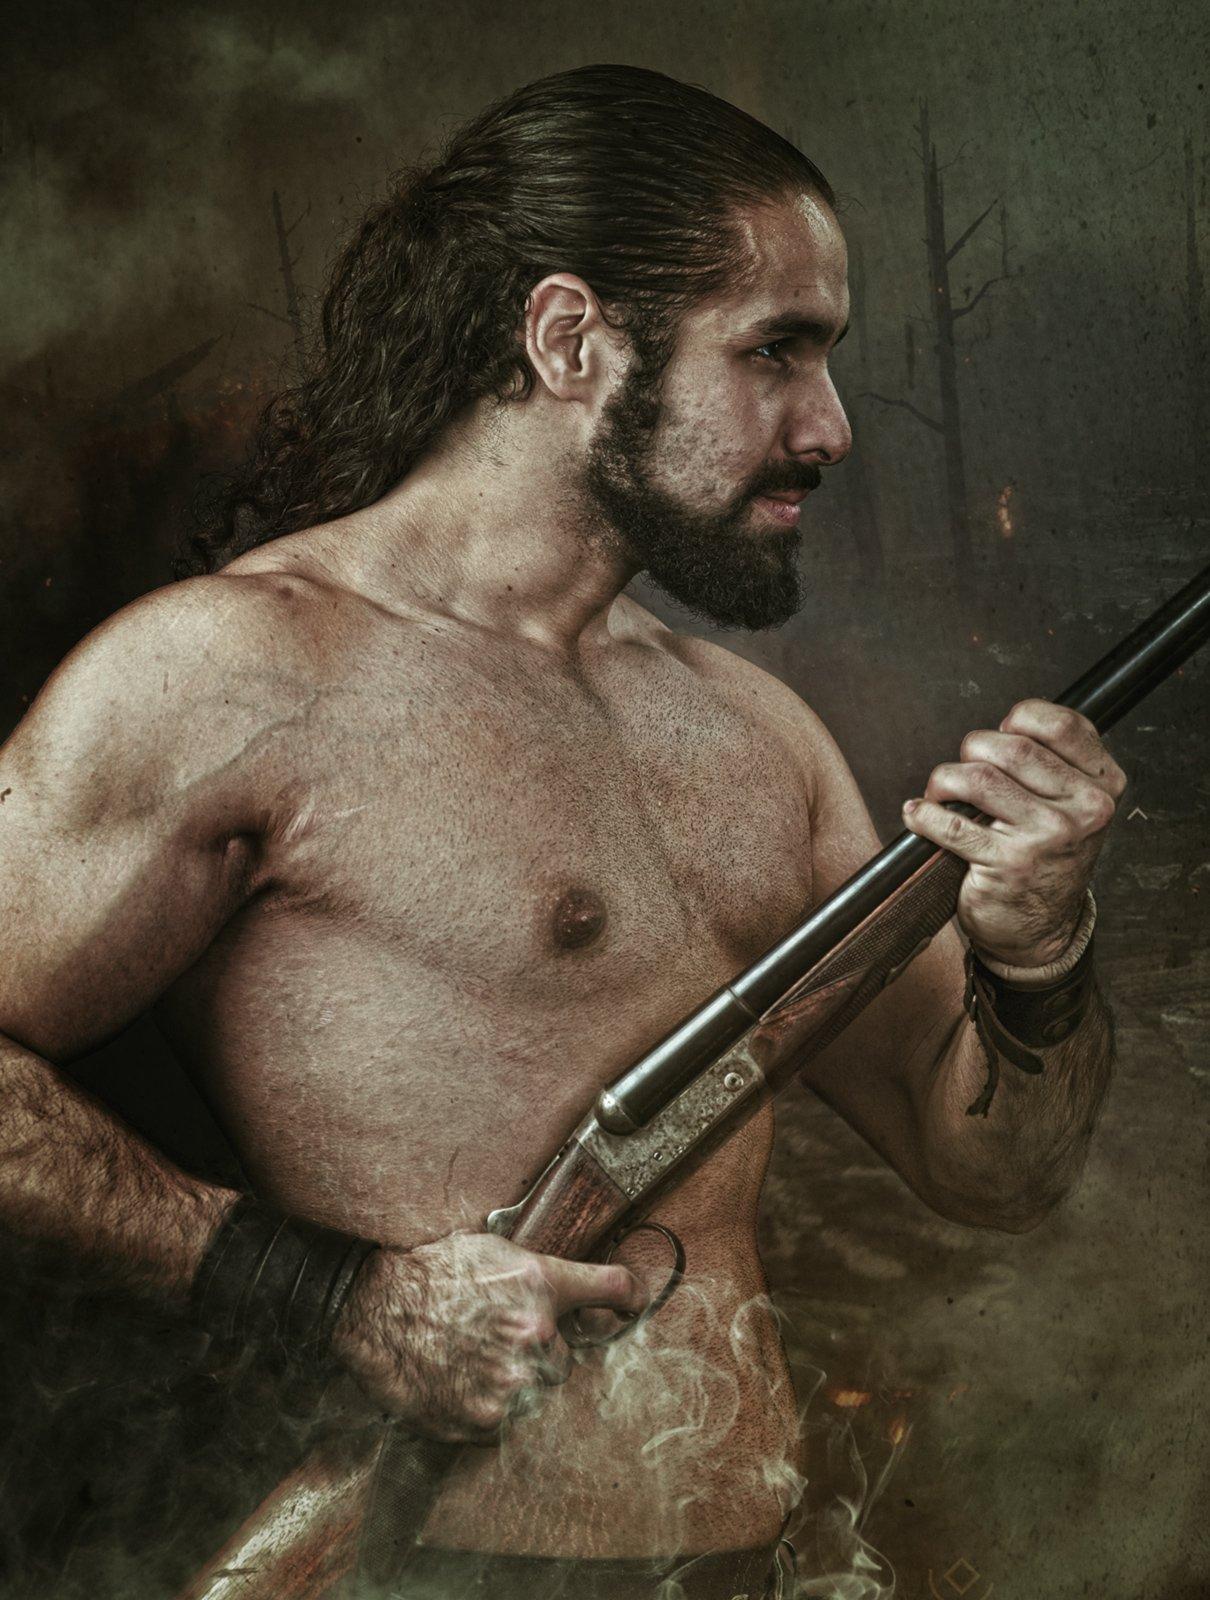 trapper, battle, battle of getyysburg, gettysburg, independence, warrior, fight, struggle, apocalypse, war, attack, us, Дмитрий Толоконов